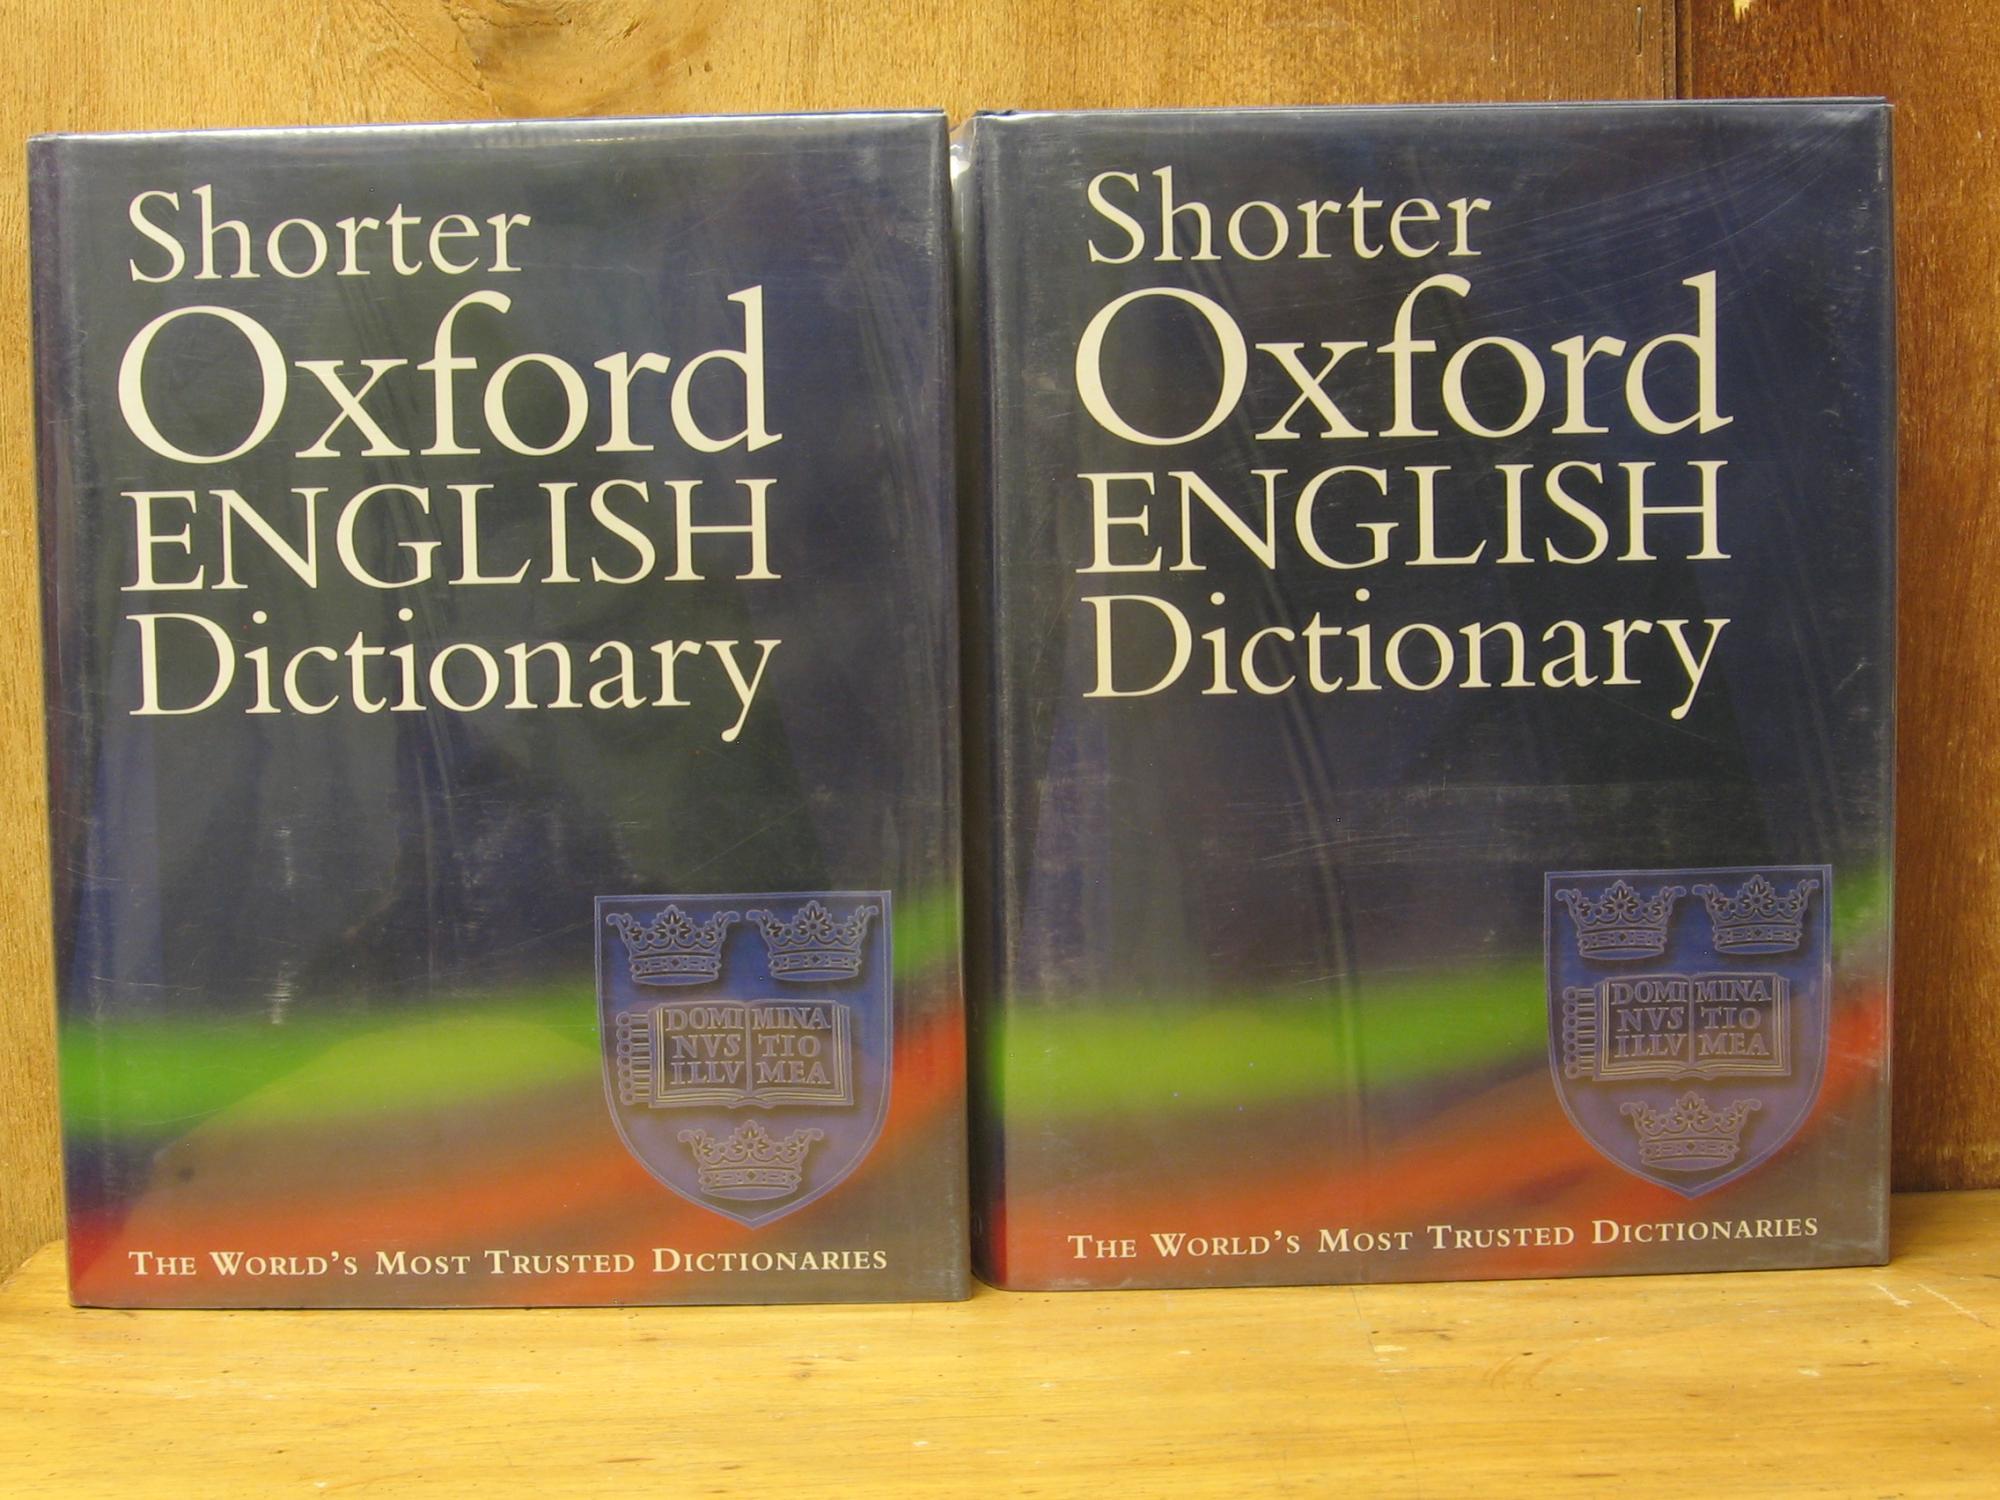 English In Italian: Shorter Oxford English Dictionary, On Historical